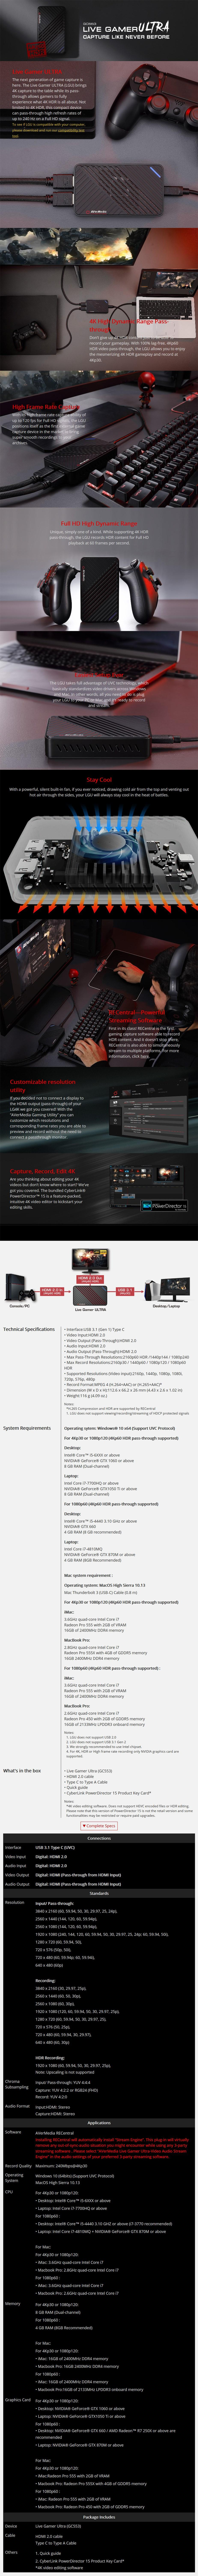 AVerMedia GC553 Live Gamer ULTRA Capture Device - Desktop Overview